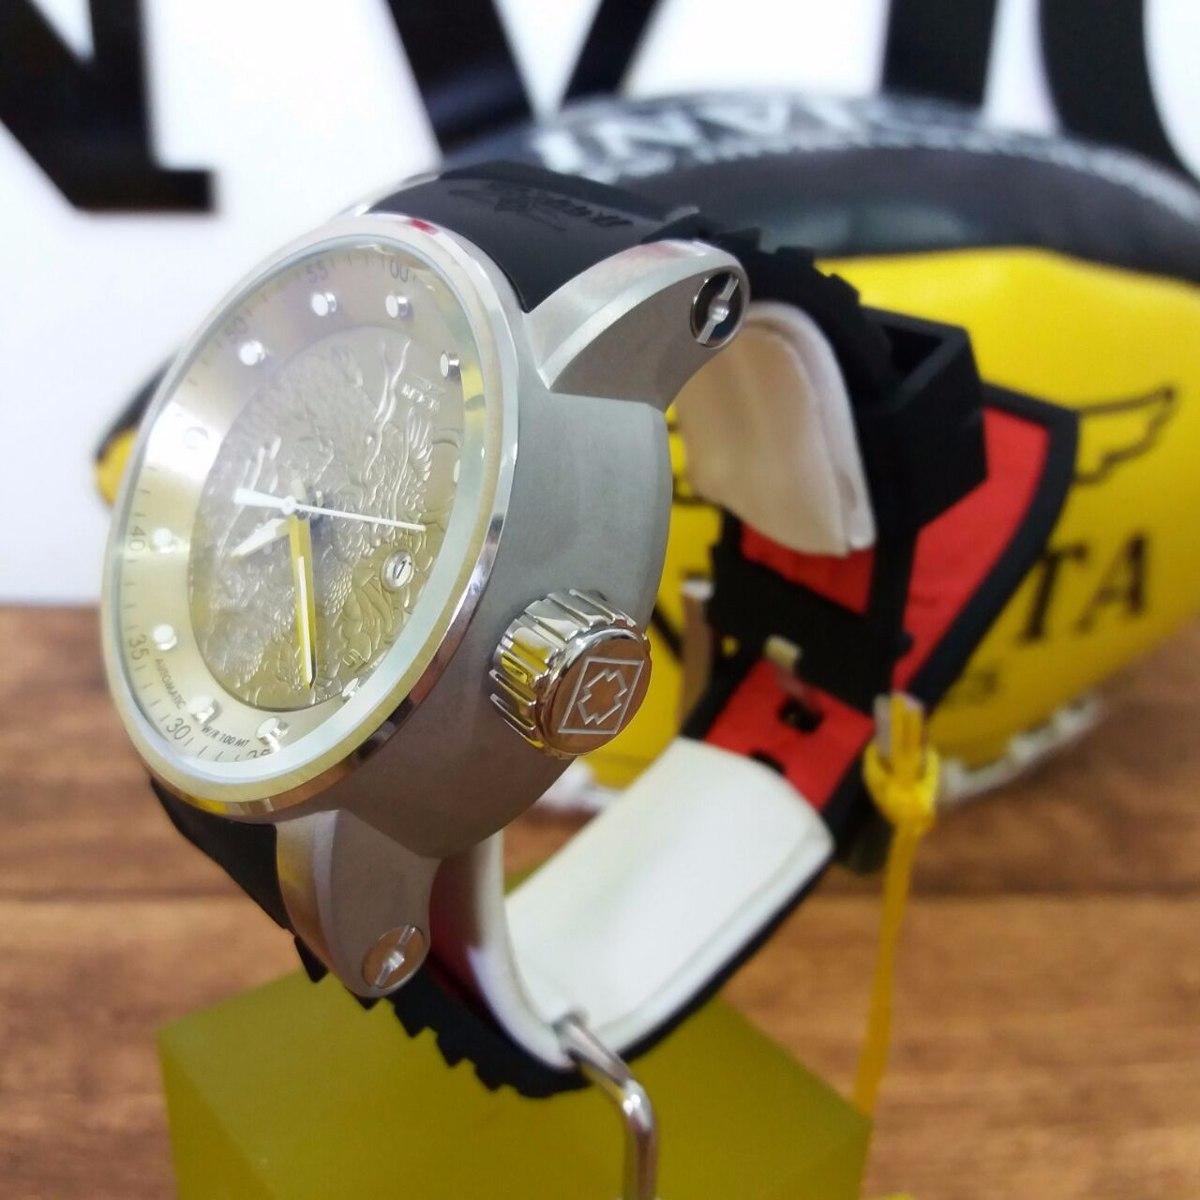 ea8c451acfe relógio invicta yakuza 15862 dragon prata com preto original. Carregando  zoom.